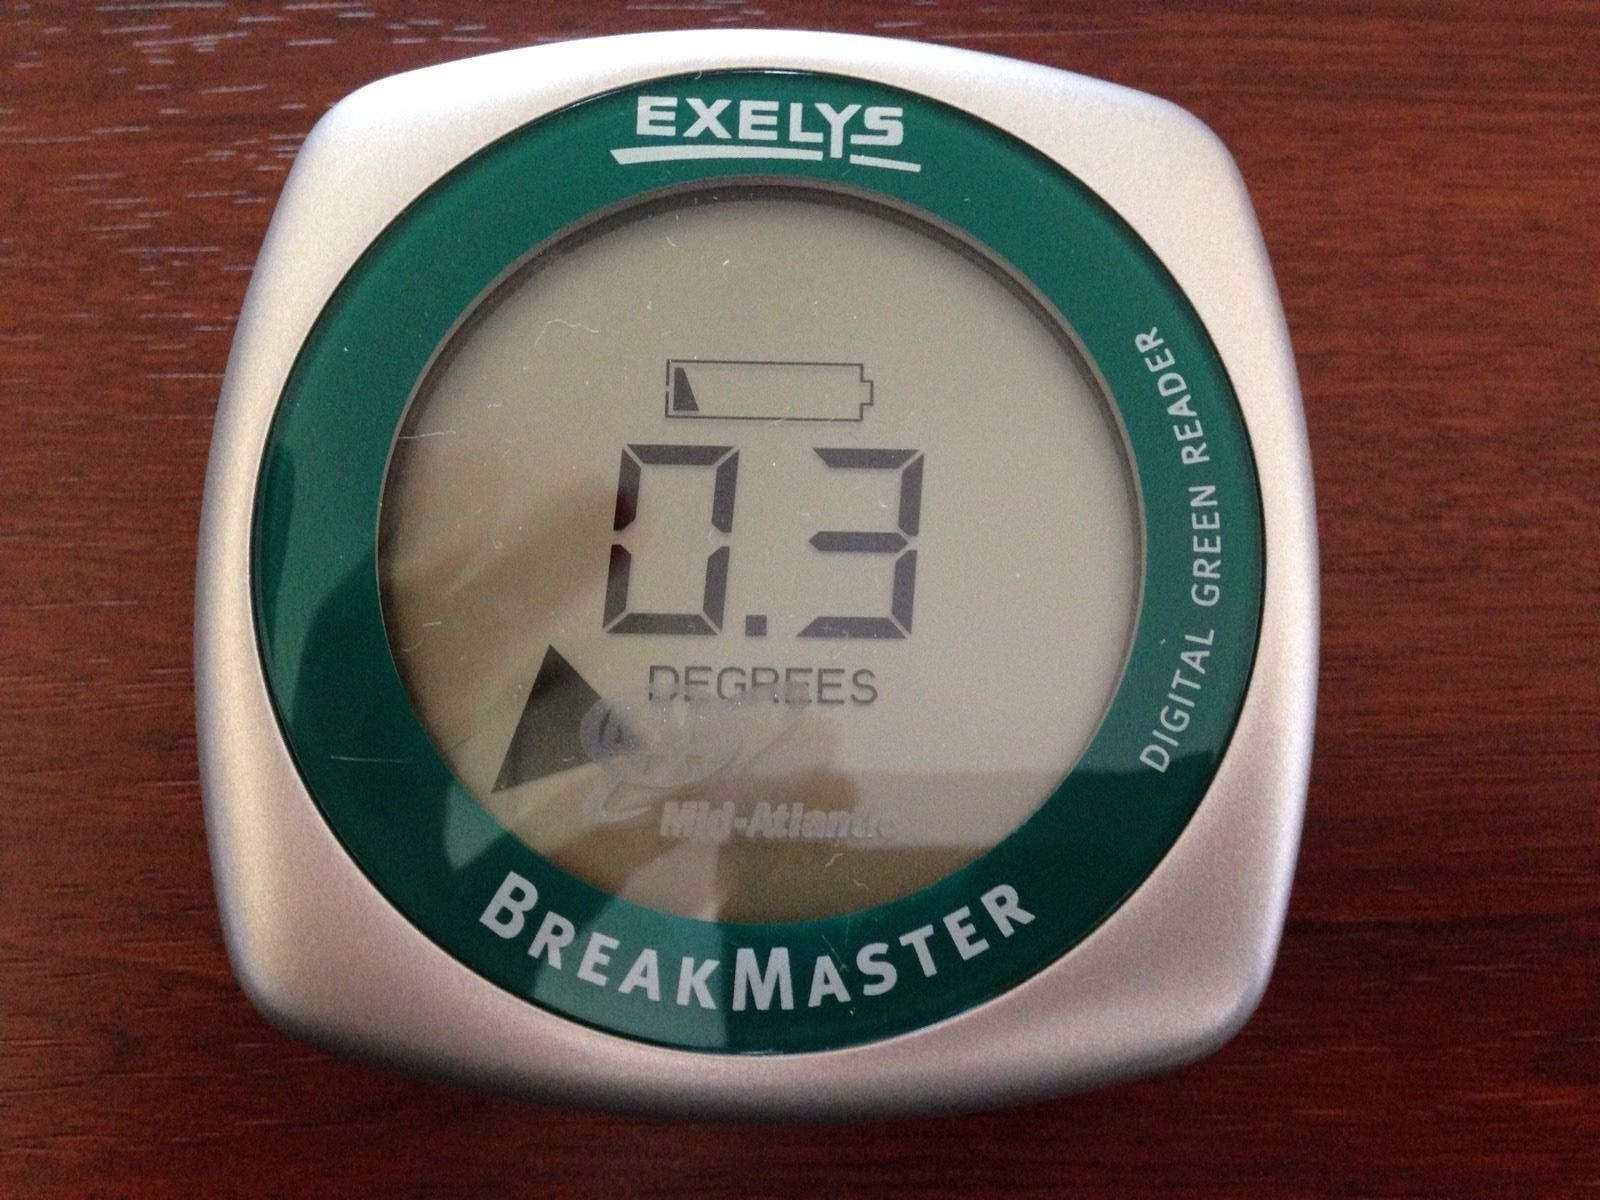 BreakmasterGolfExelysGreenReaderTrainingAidManual